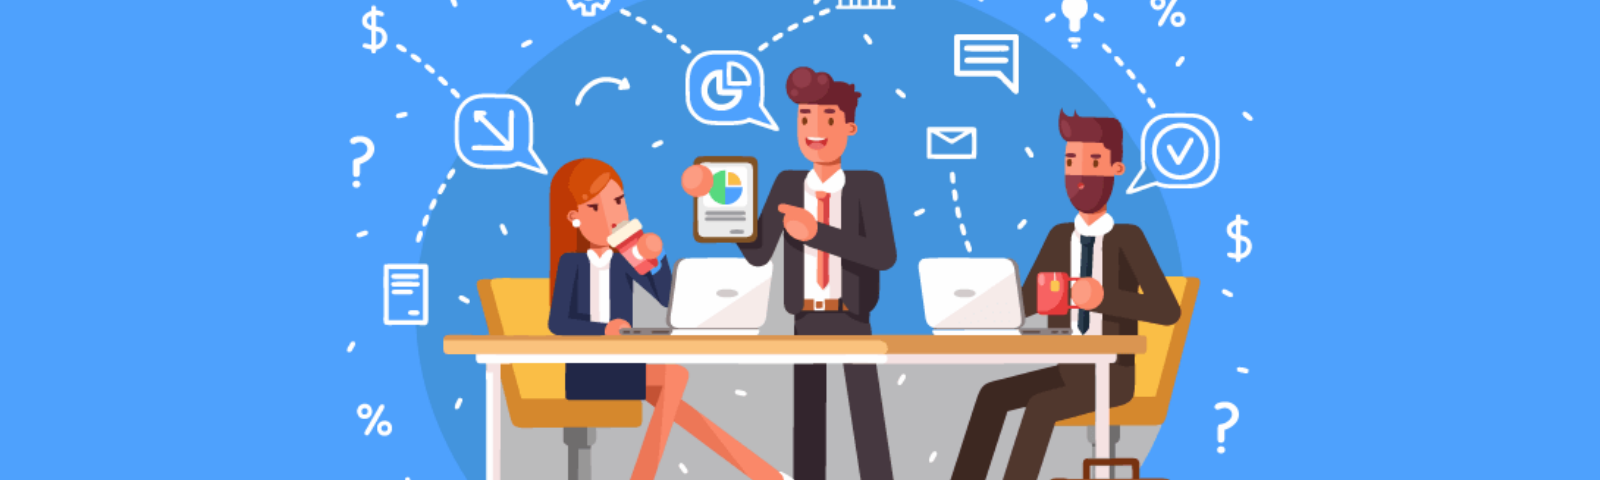 effective team management. Collaboration clipart group task